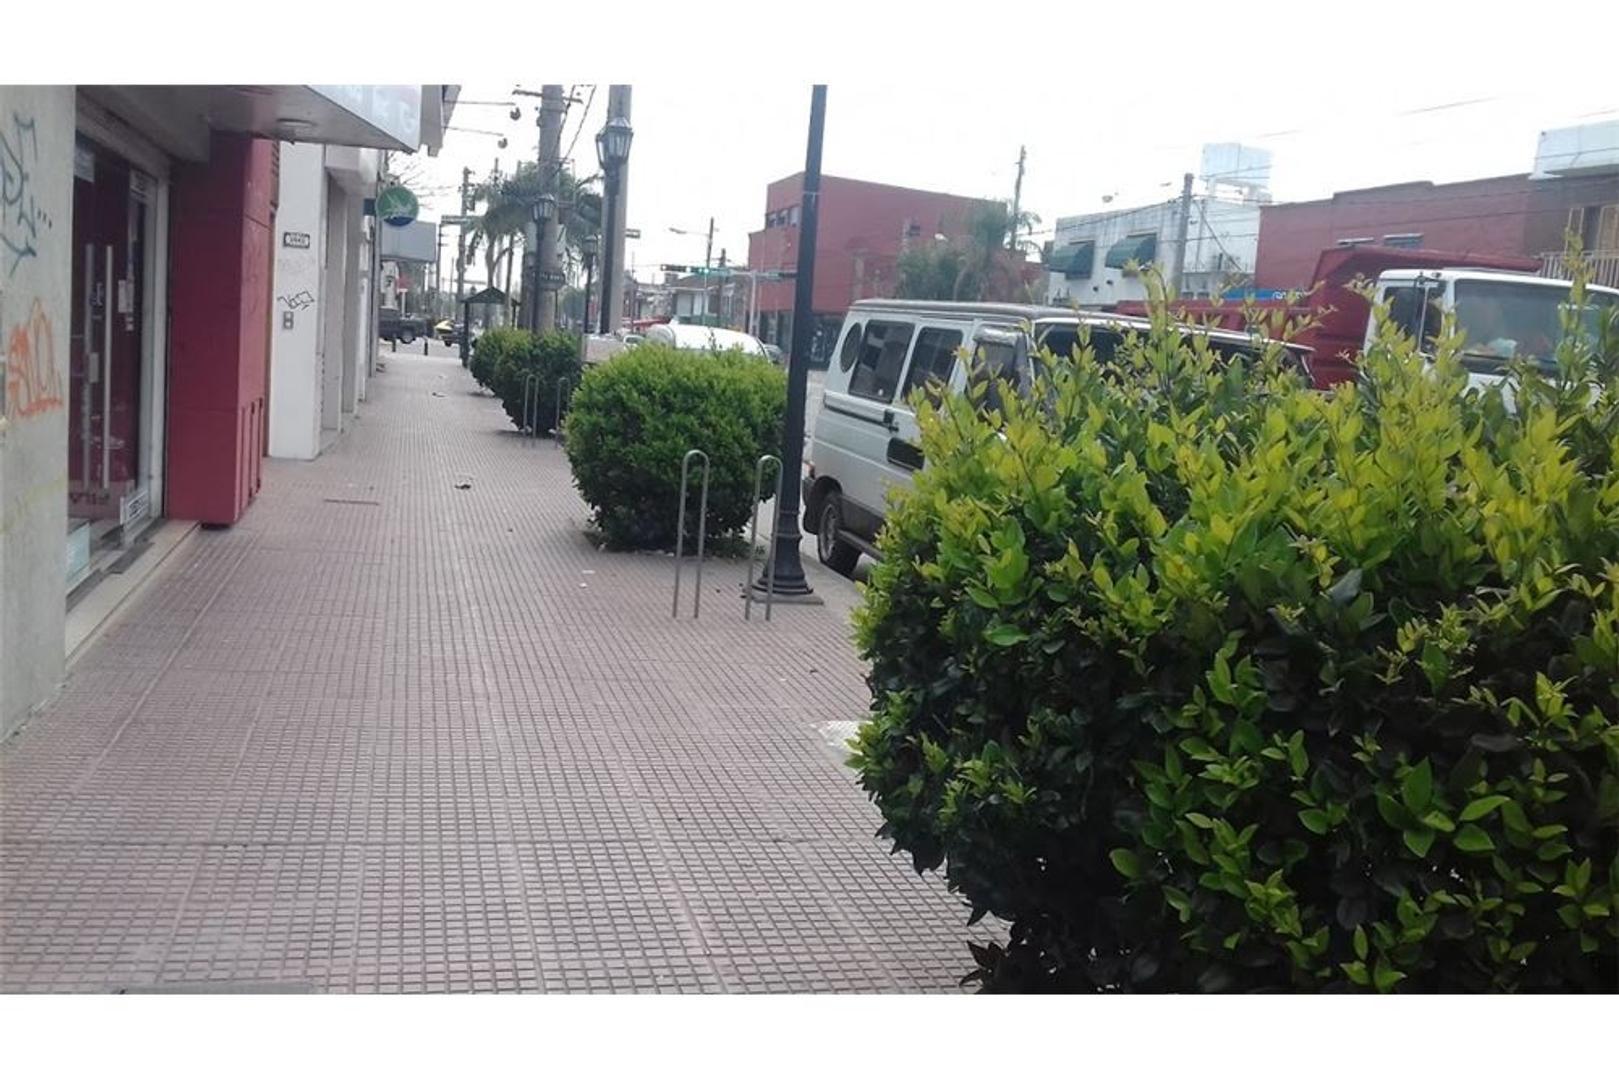 TERRENO  VENTA RUTA 27, TIGRE- AV.SANTA MARIA DE LAS CONCHAS 2900,TIGRE CENTRO